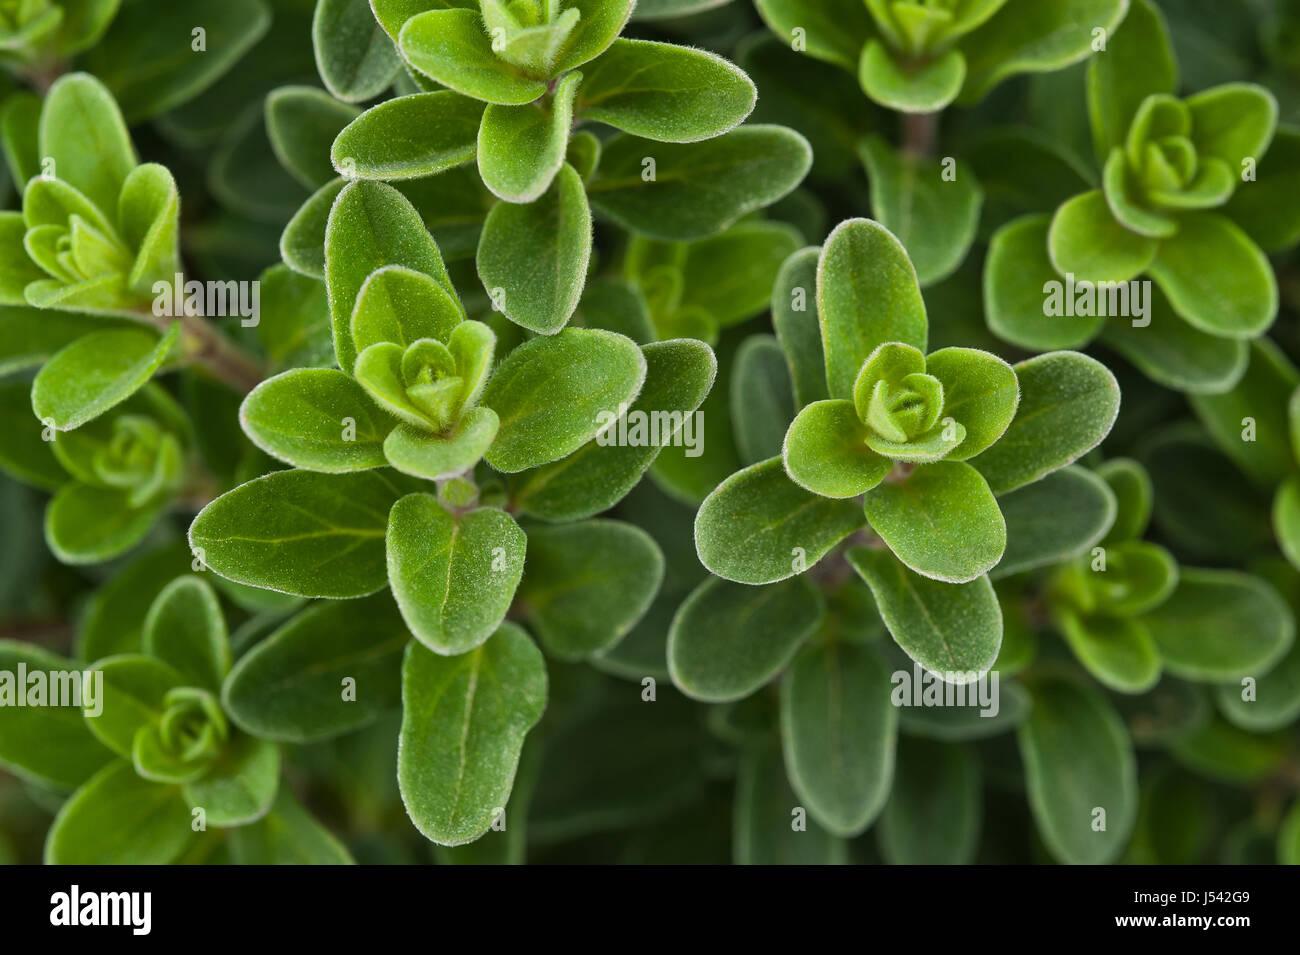 Fresh marjoram,Marjoram background, sprig of marjoram - Stock Image